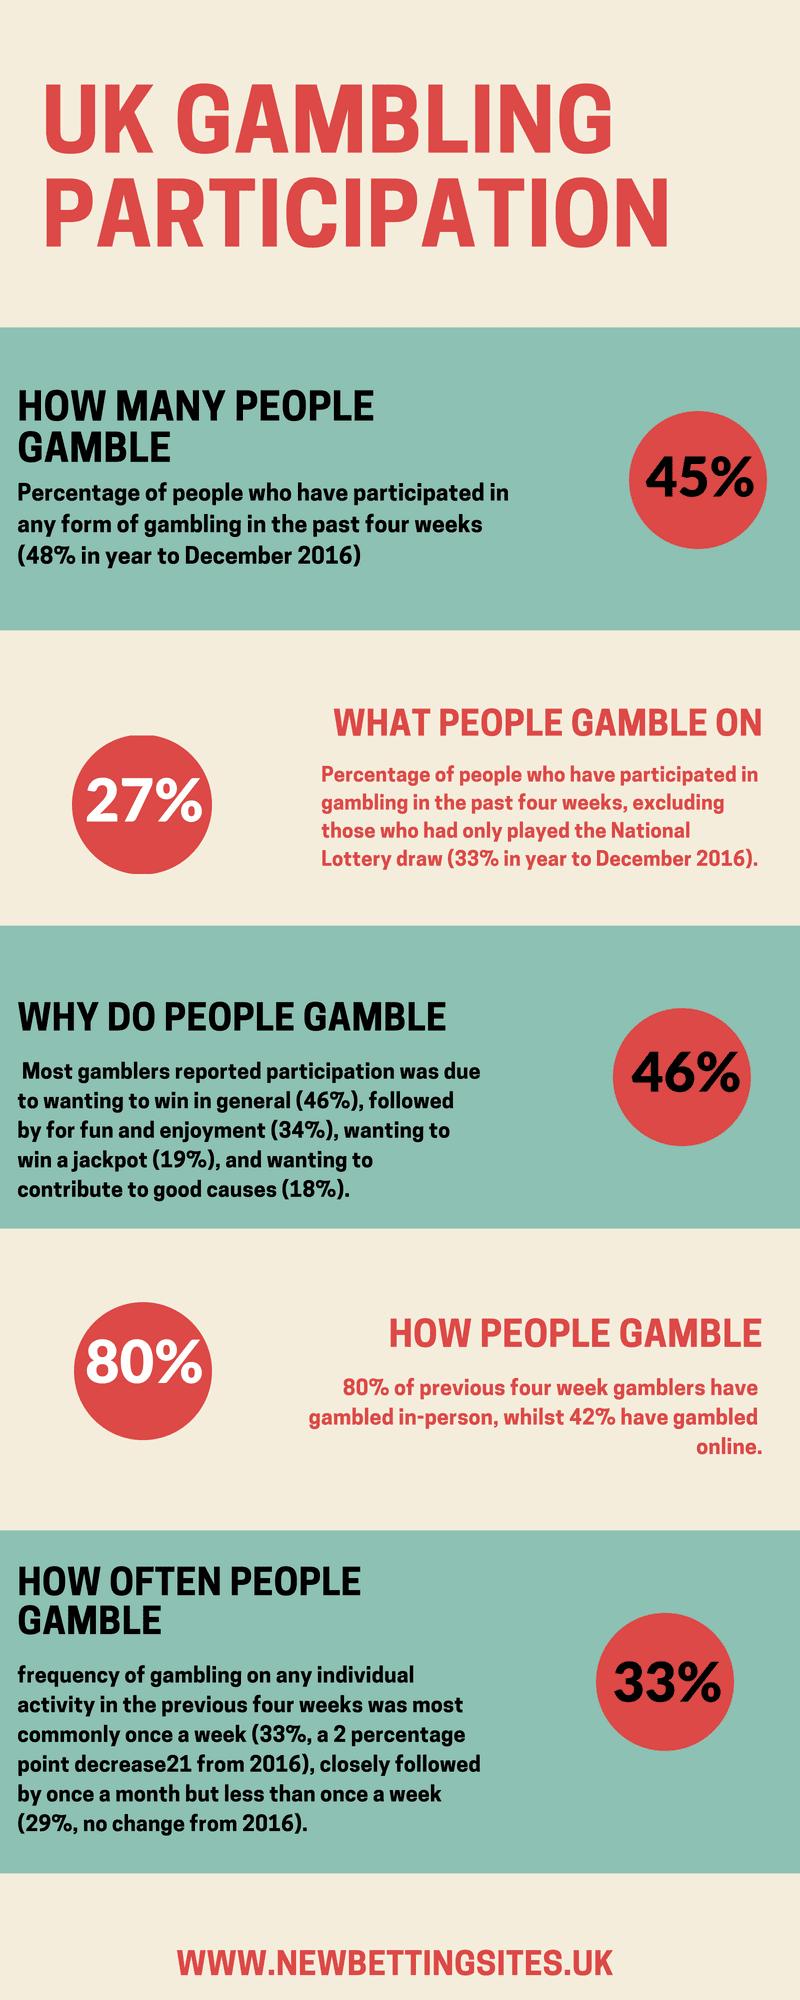 UK GAMBLING PARTICIPATION